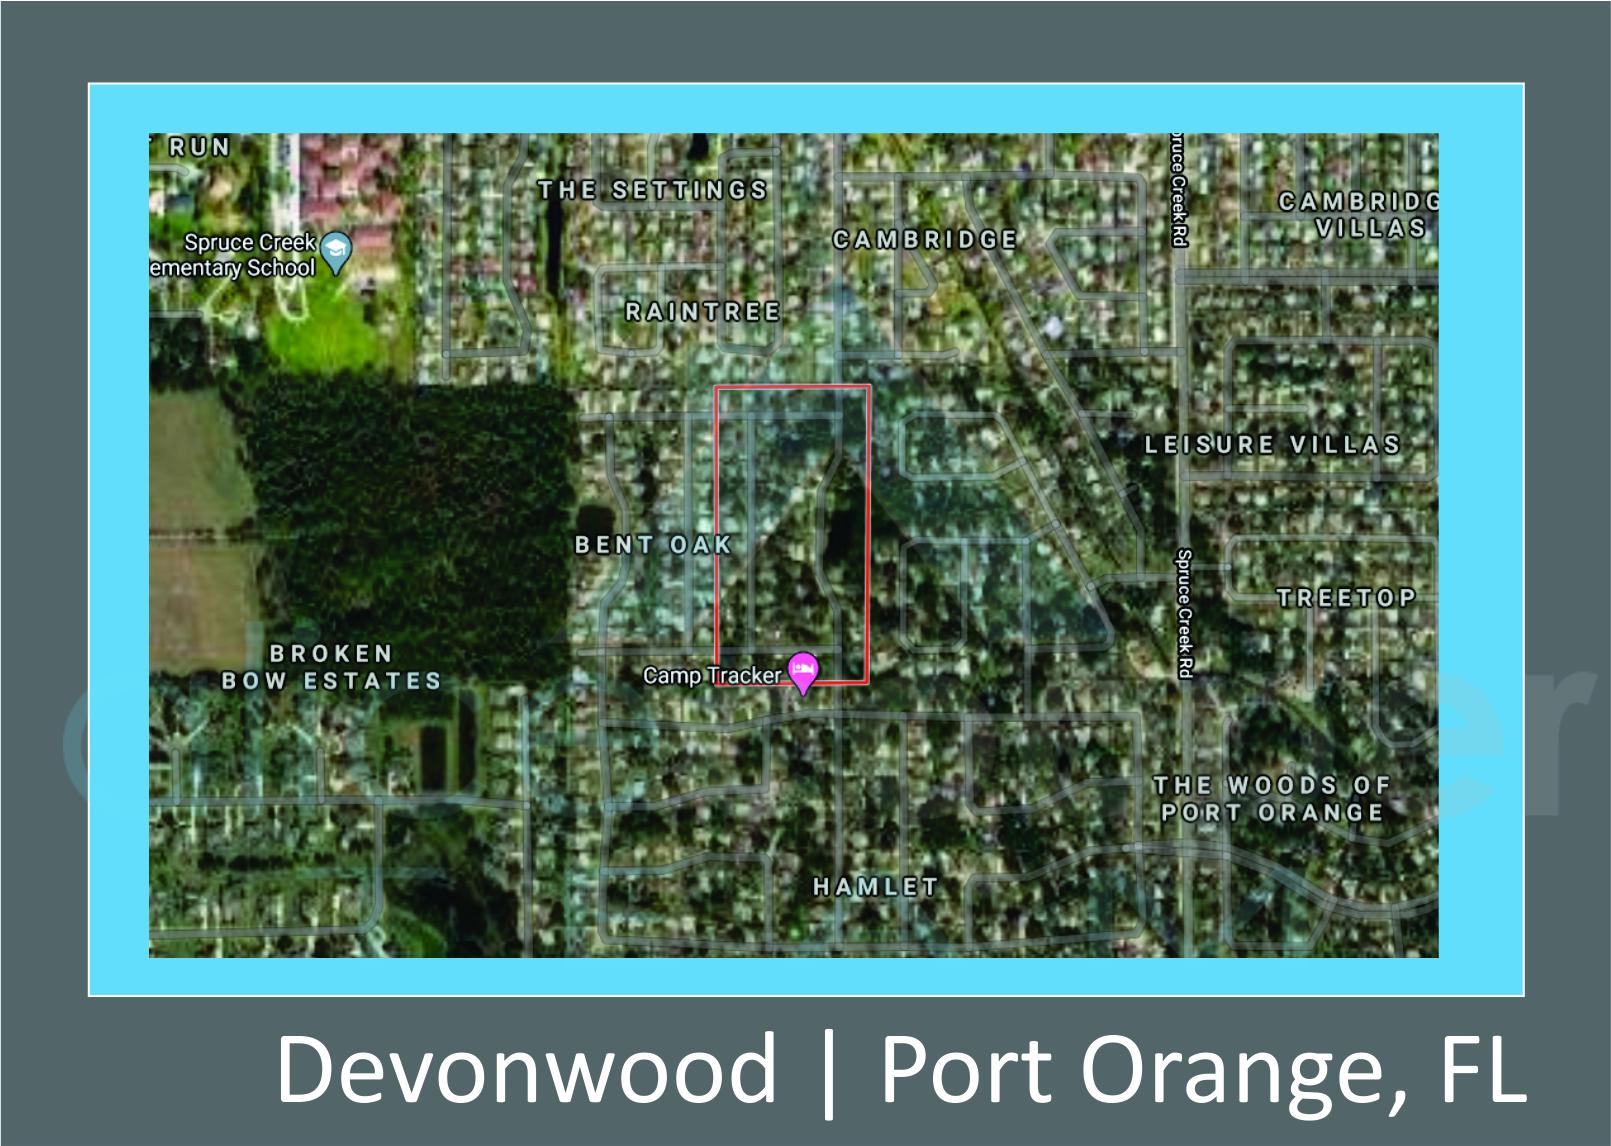 Map of Devonwood Port Orange, FL